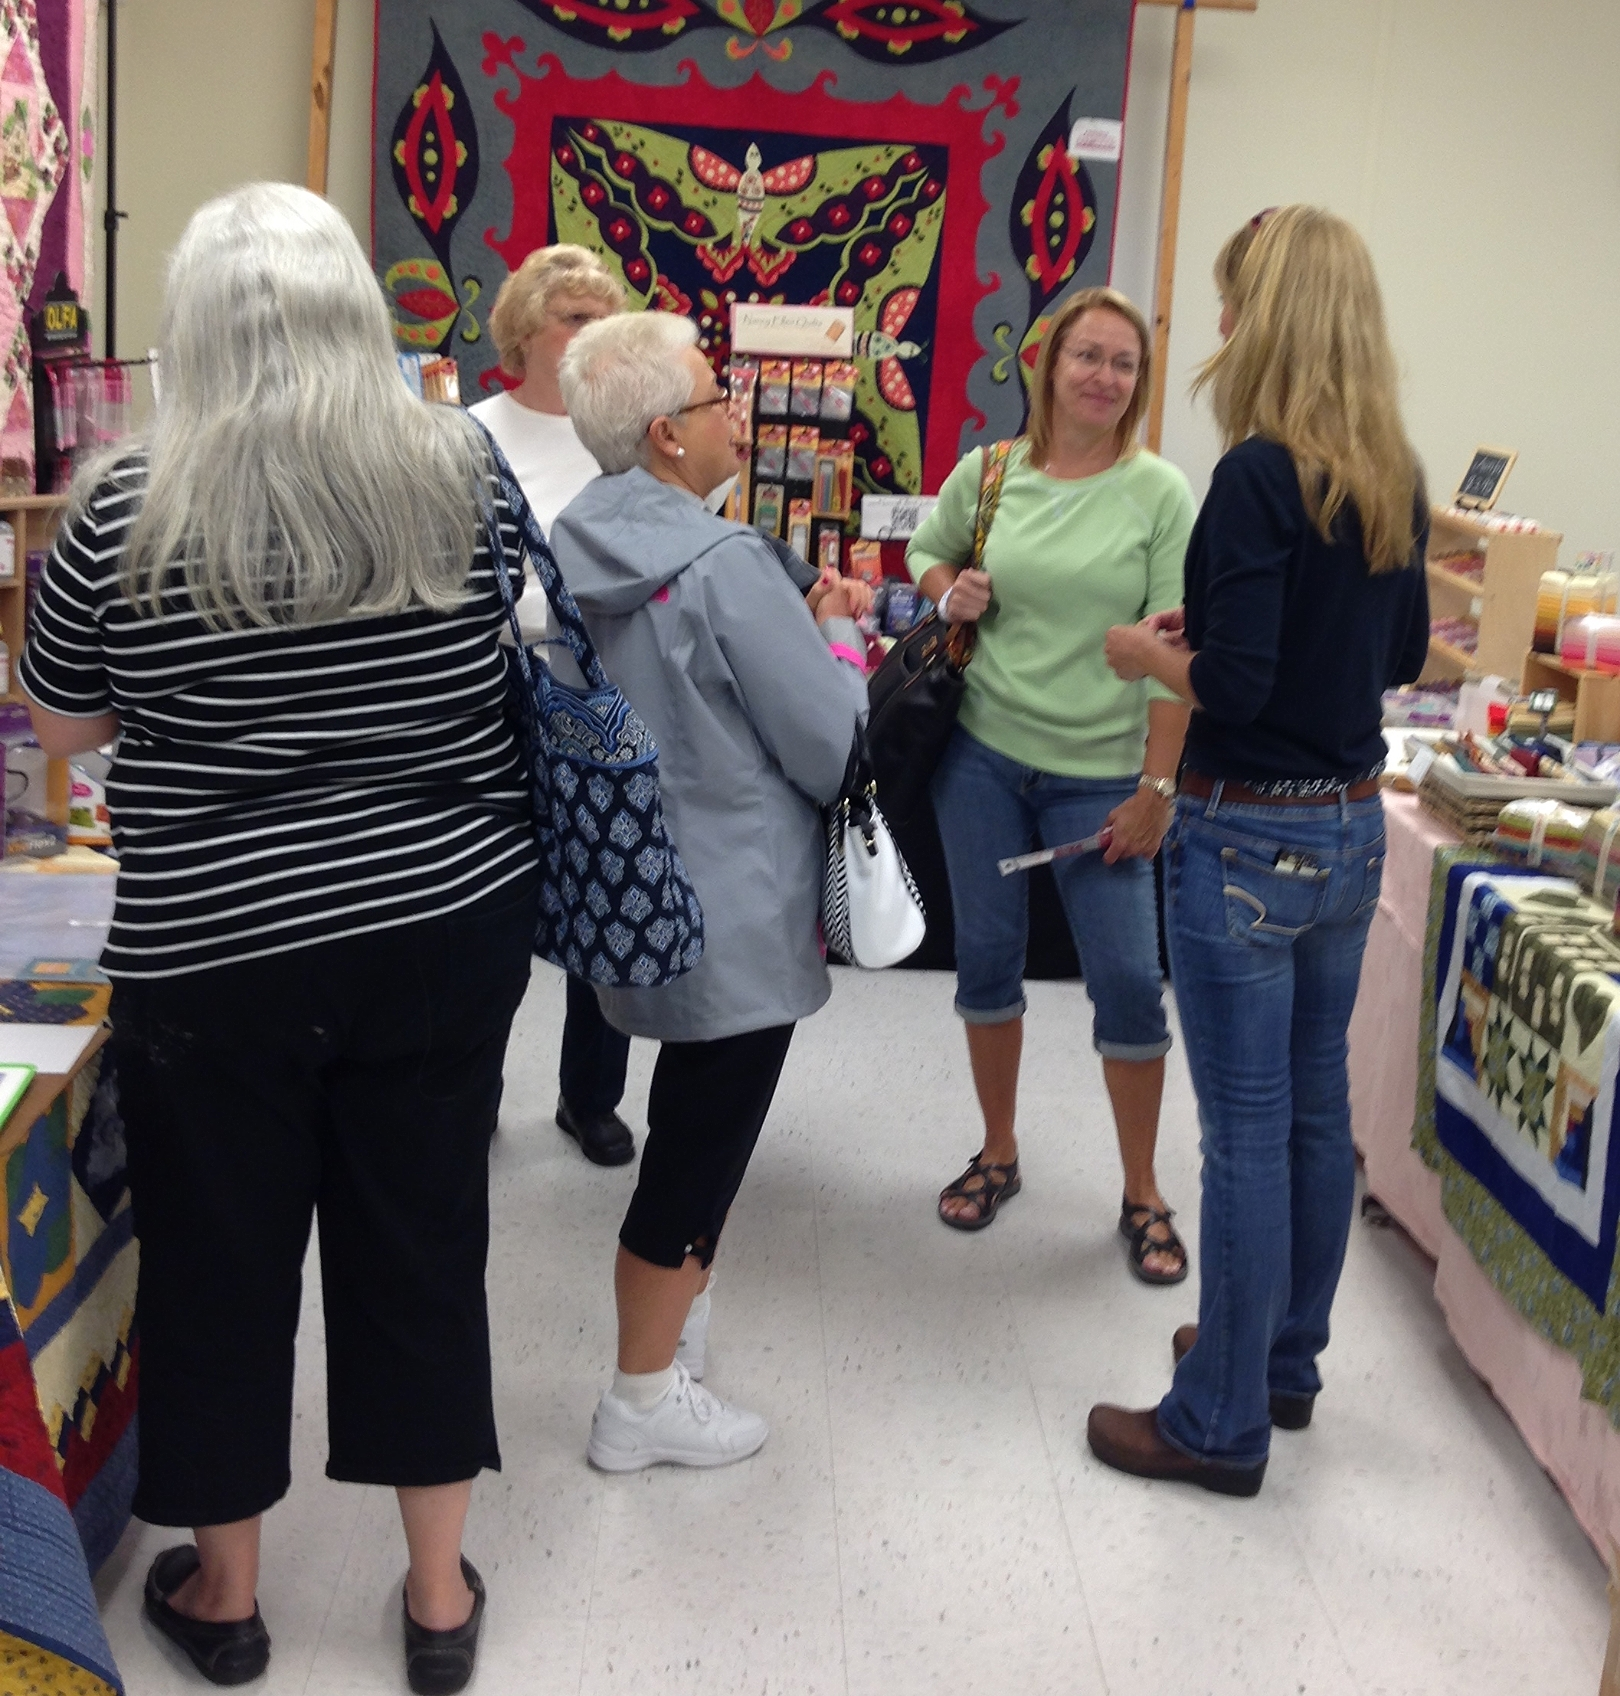 Nancy Ellen Quilts vending at a quilt show on Long Island